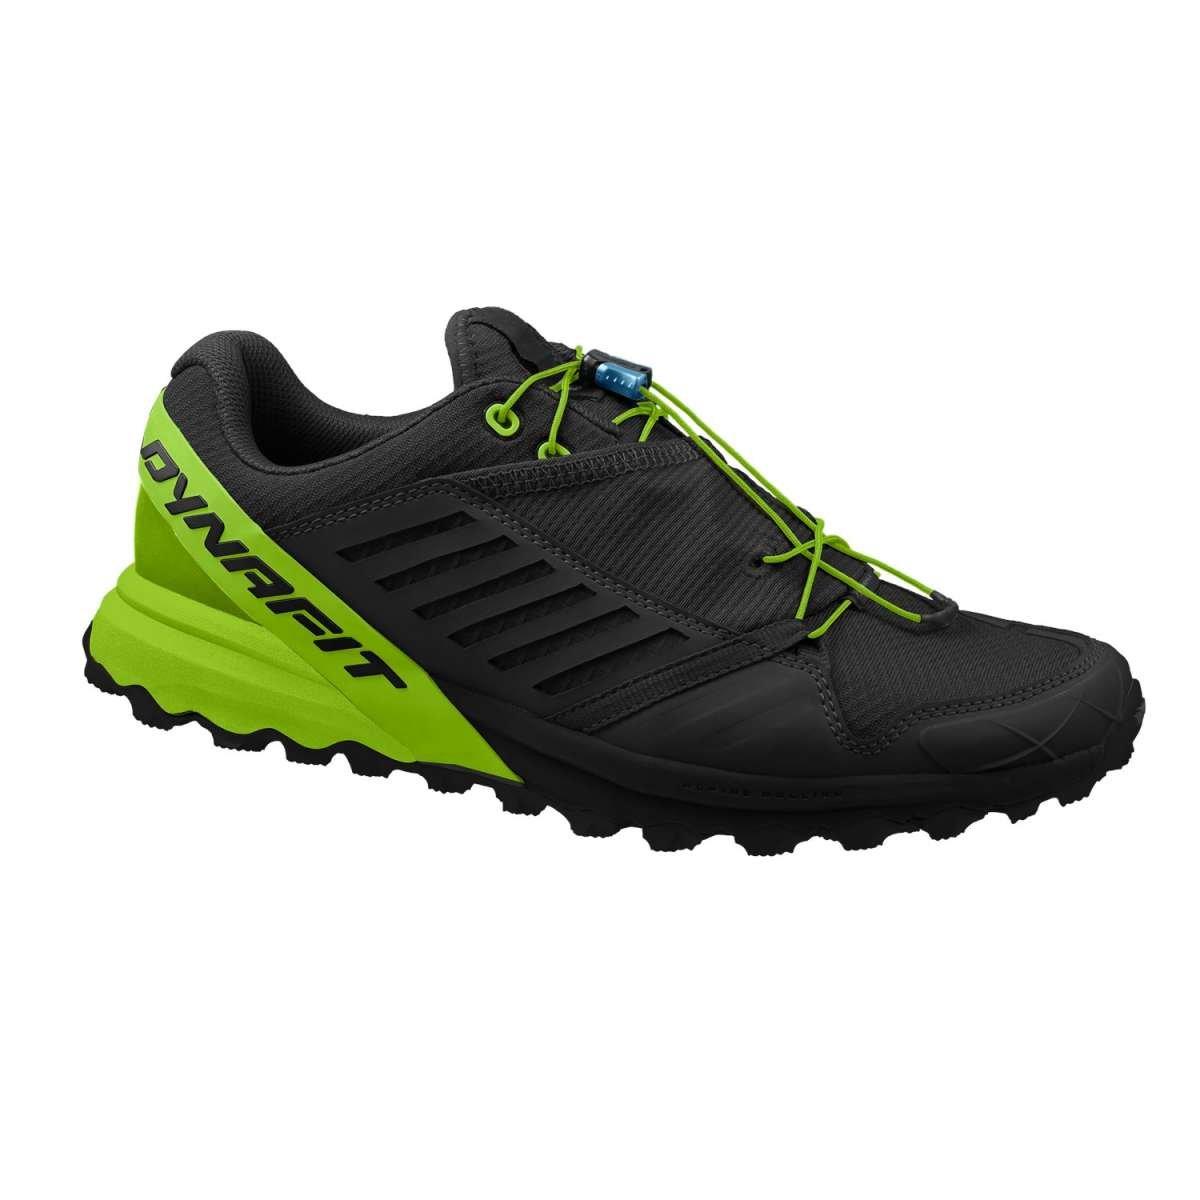 Dynafit Alpine Pro, Zapatillas de Running para Asfalto Hombre 7.5|Specialfeatures*64028 Black/Dna